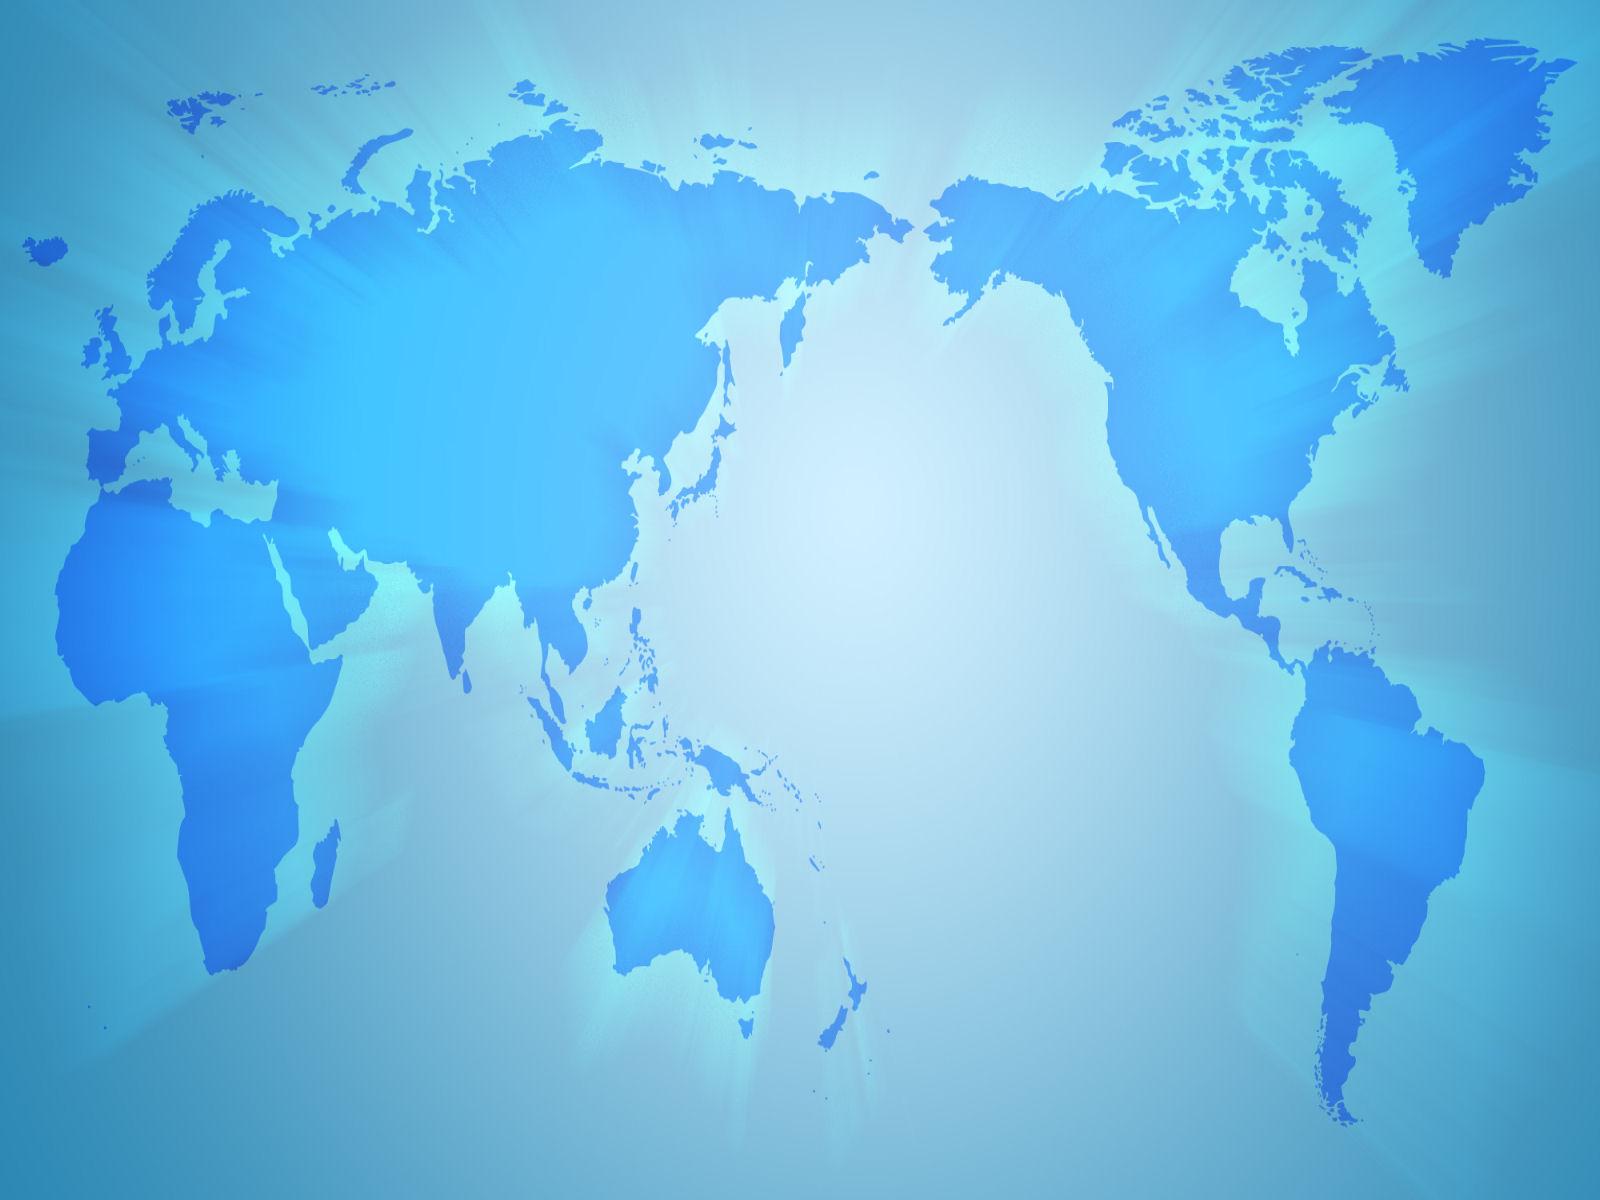 HD World Map Wallpaper WallpaperSafari